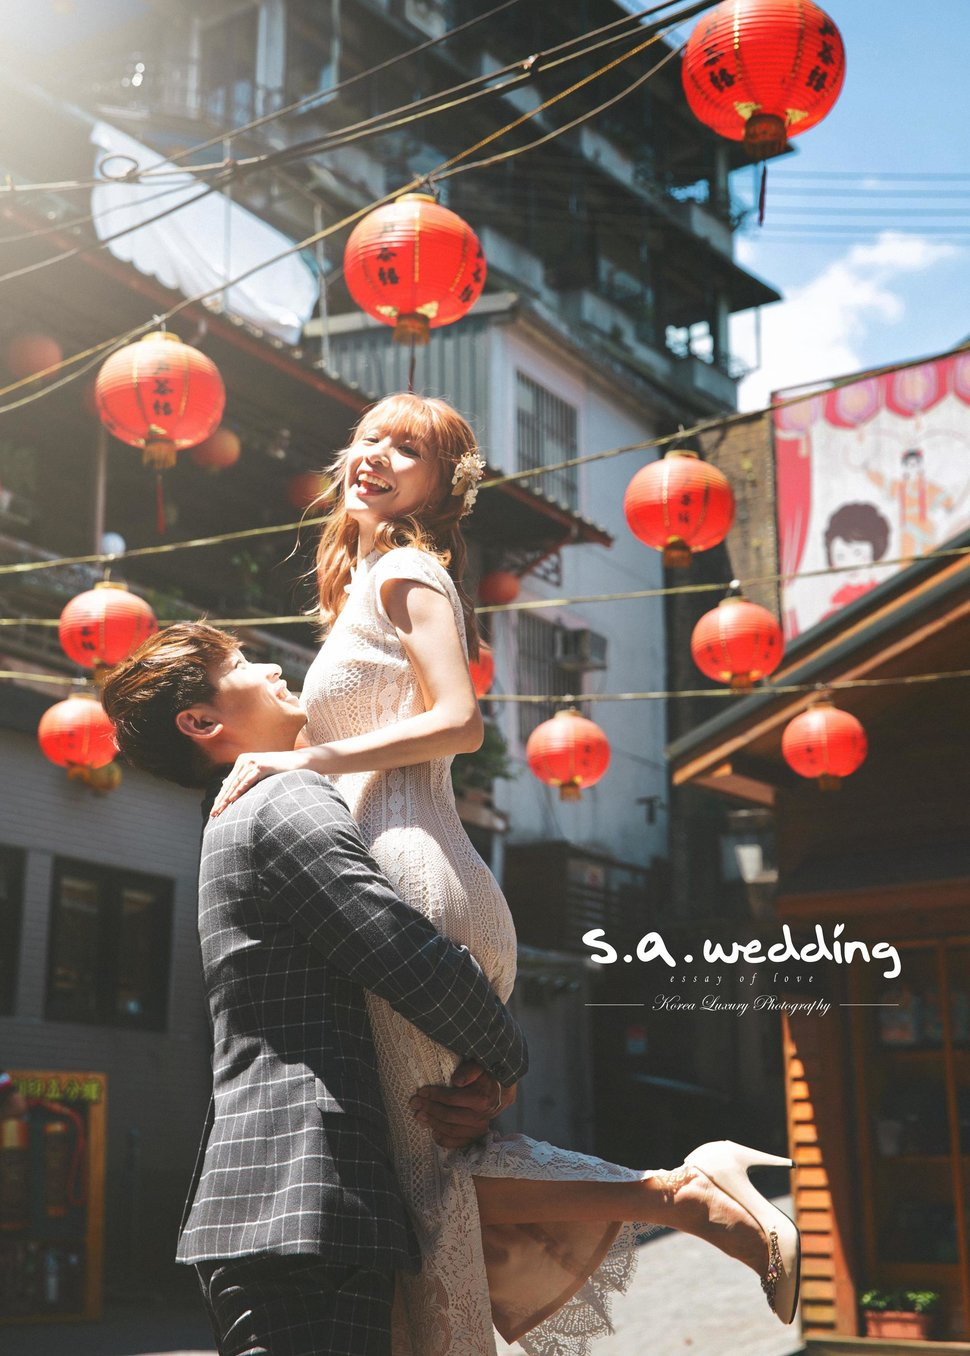 NSH_0619_ps (Copy) - s.a. wedding 韓國婚紗攝影《結婚吧》